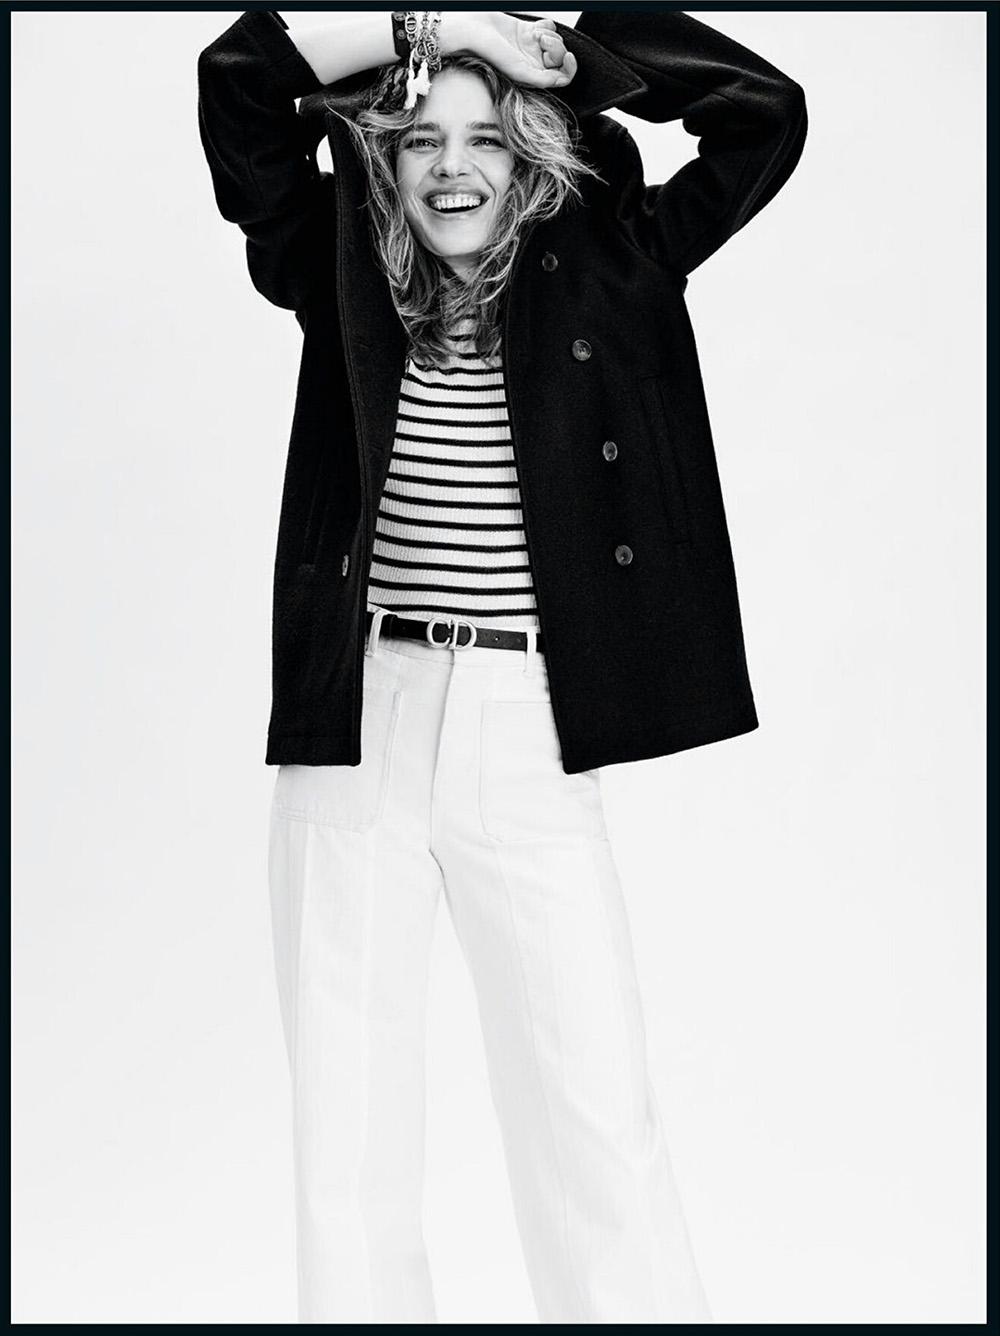 Natalia Vodianova covers Vogue Paris August 2020 by Nathaniel Goldberg